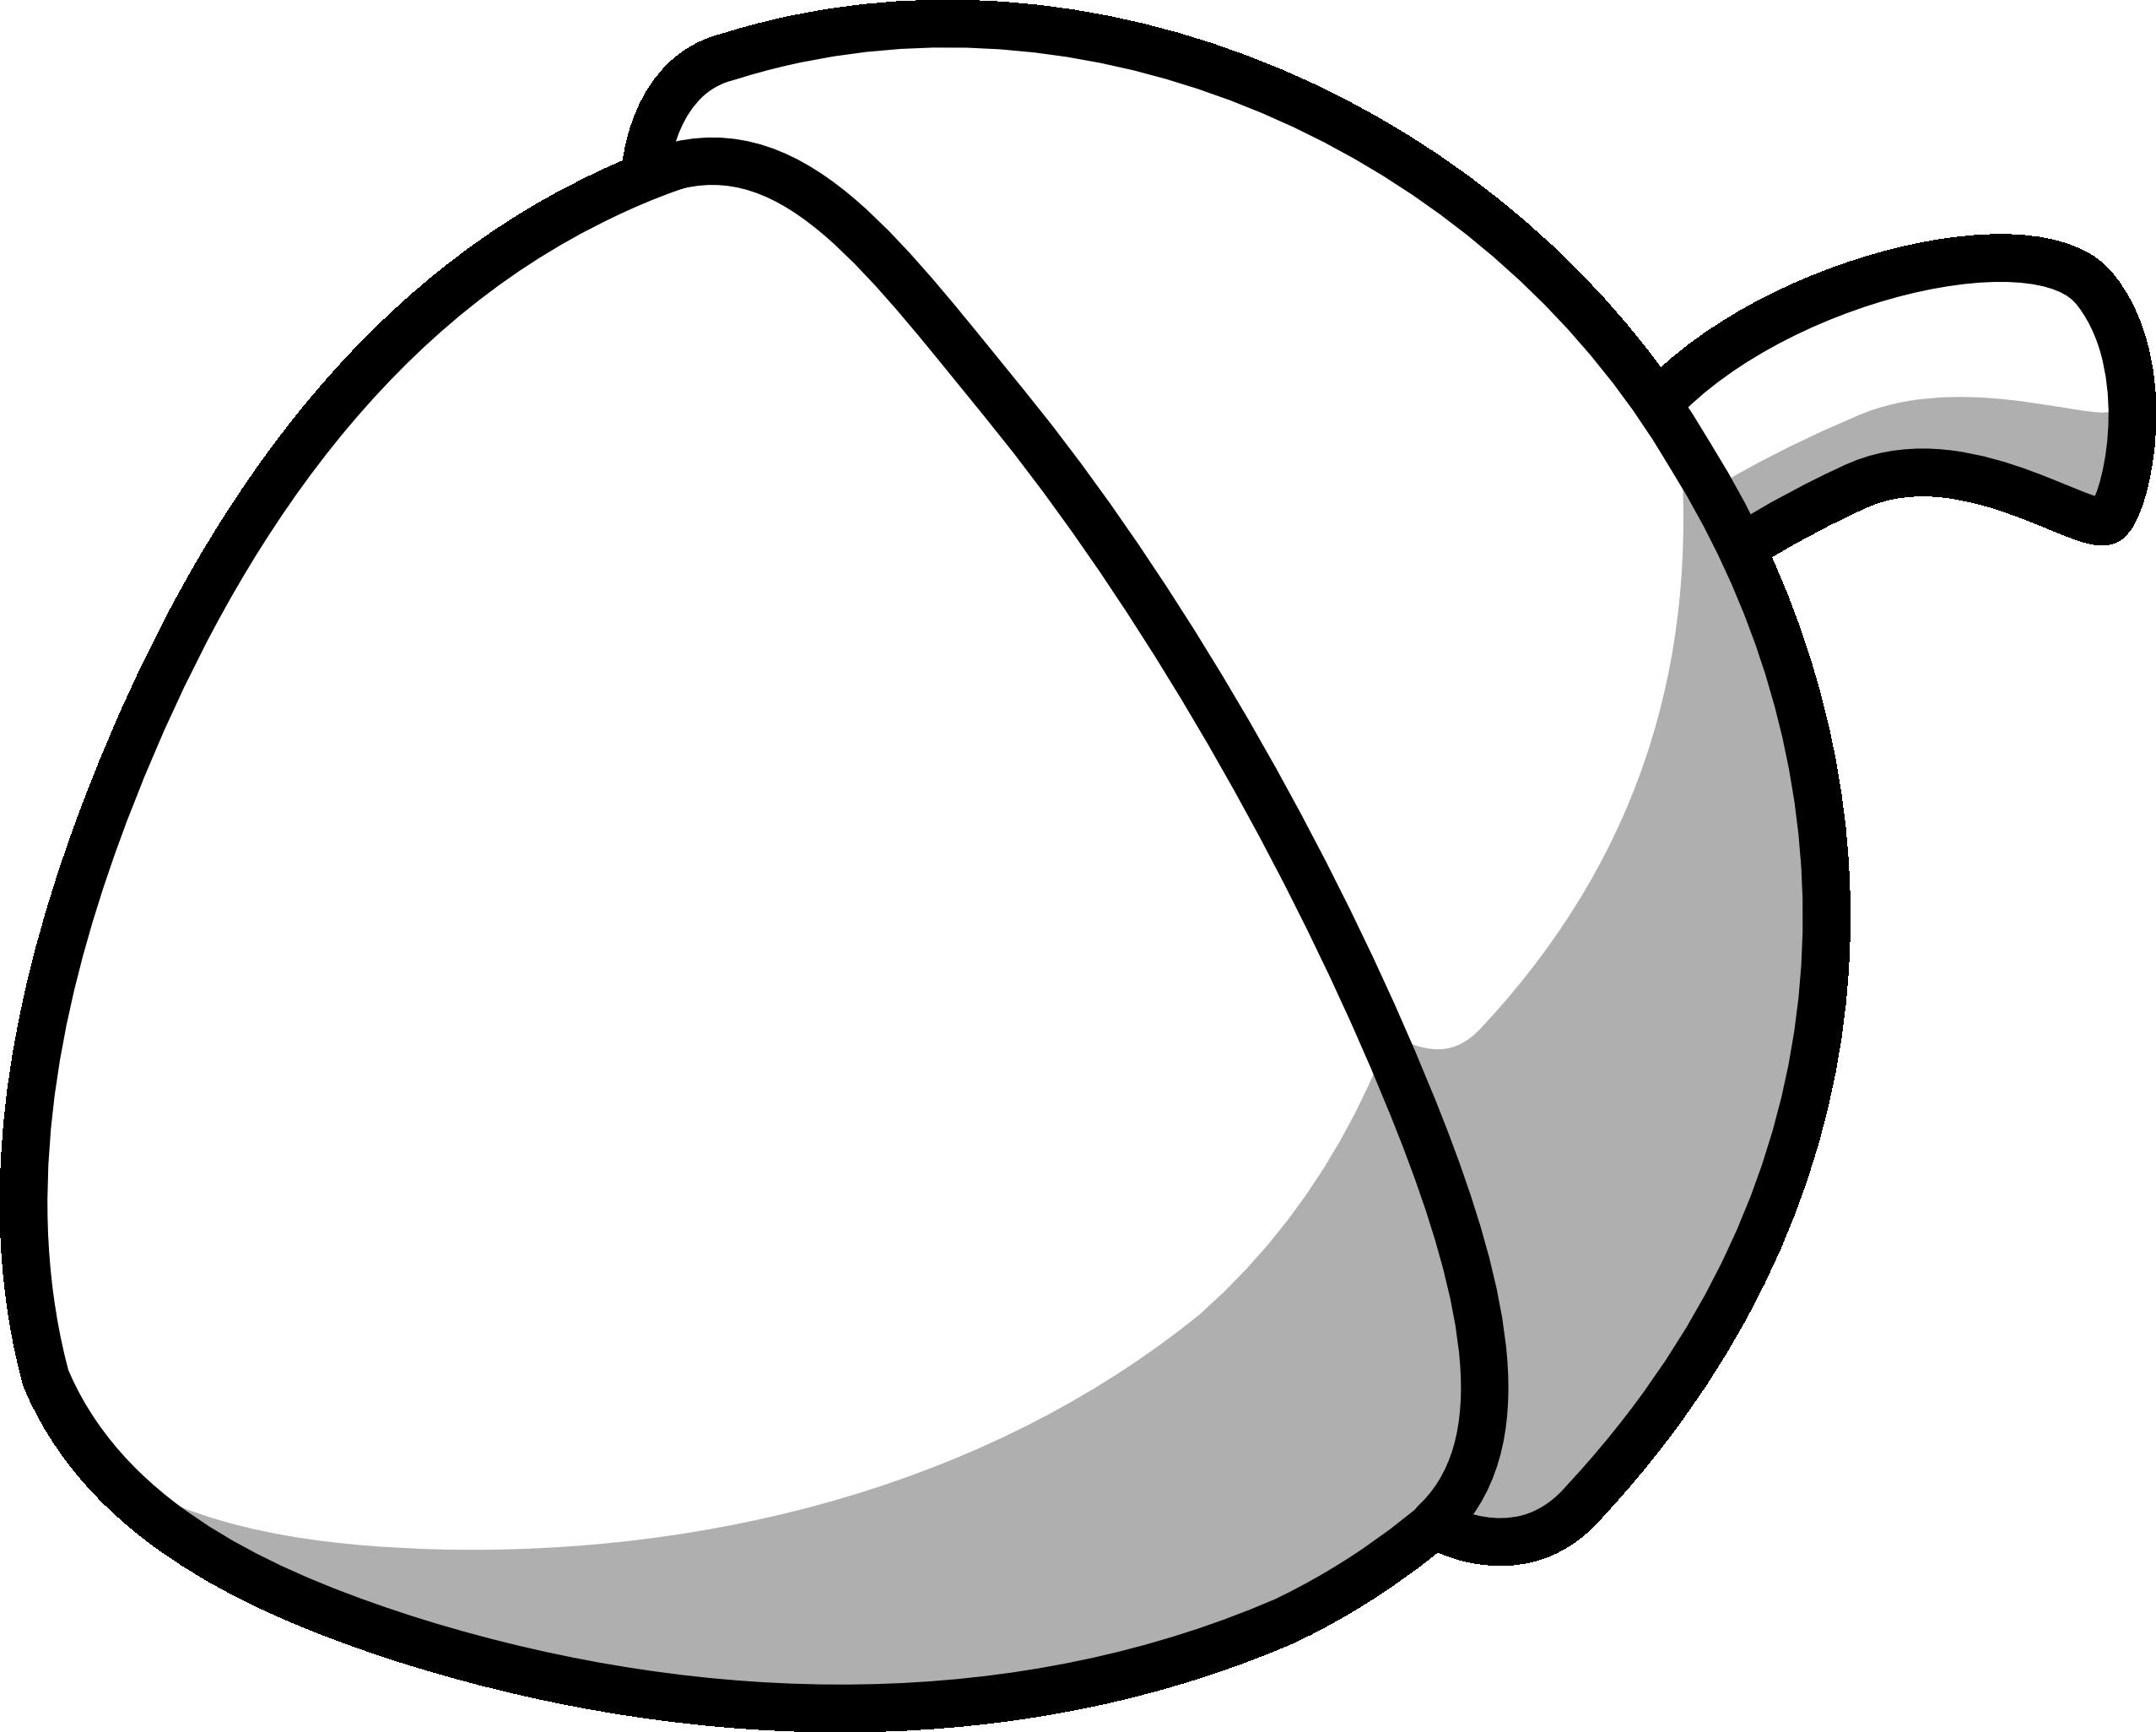 Acorn Clipart Black And White-acorn clipart black and white-0